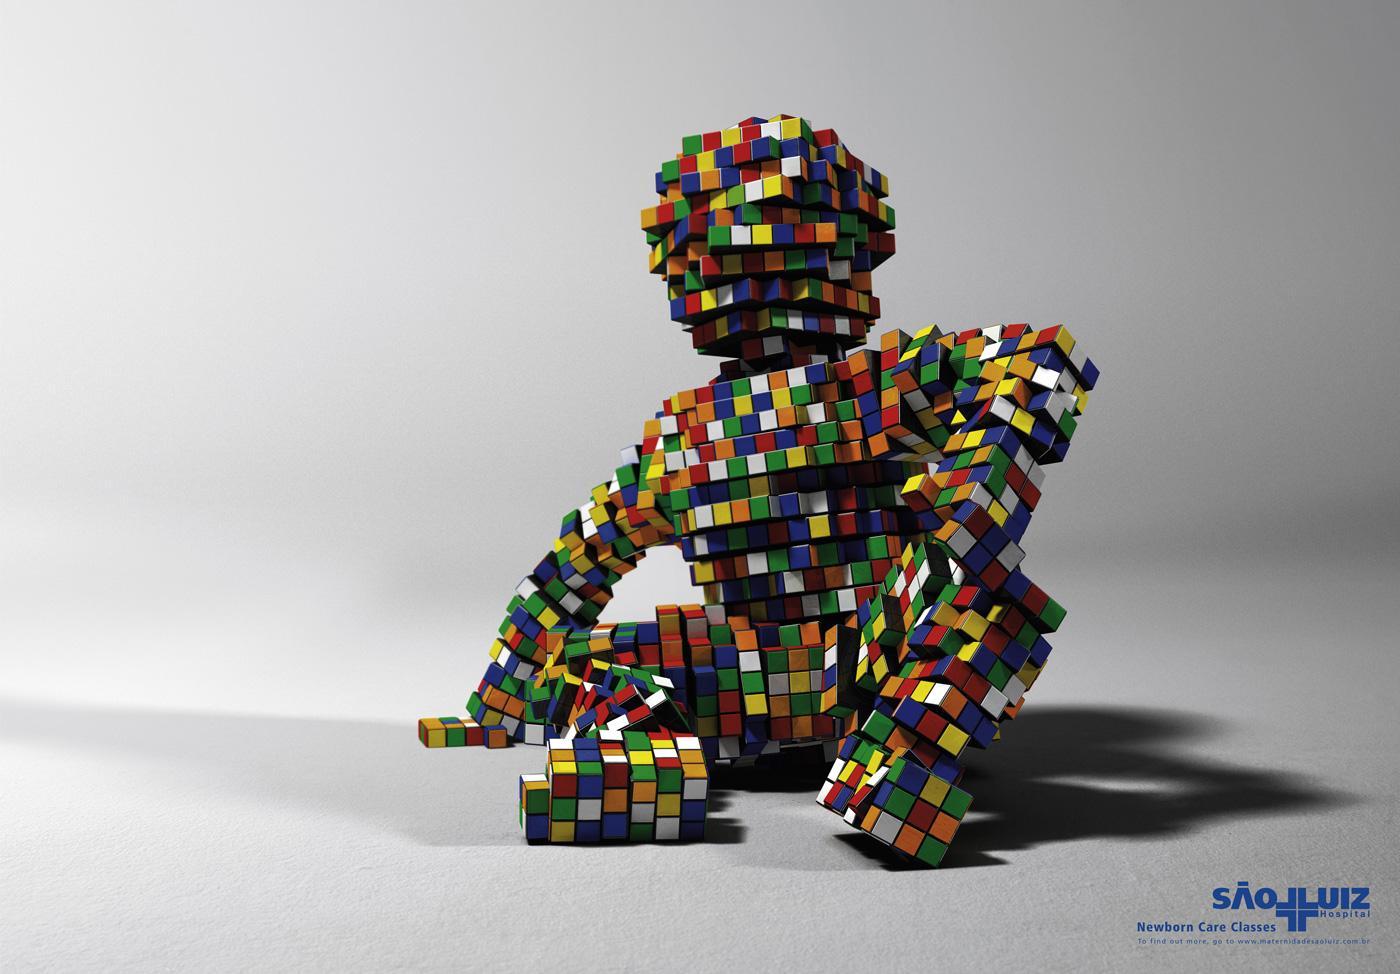 Hospital São Luiz Print Ad -  Rubik's Cube, 1